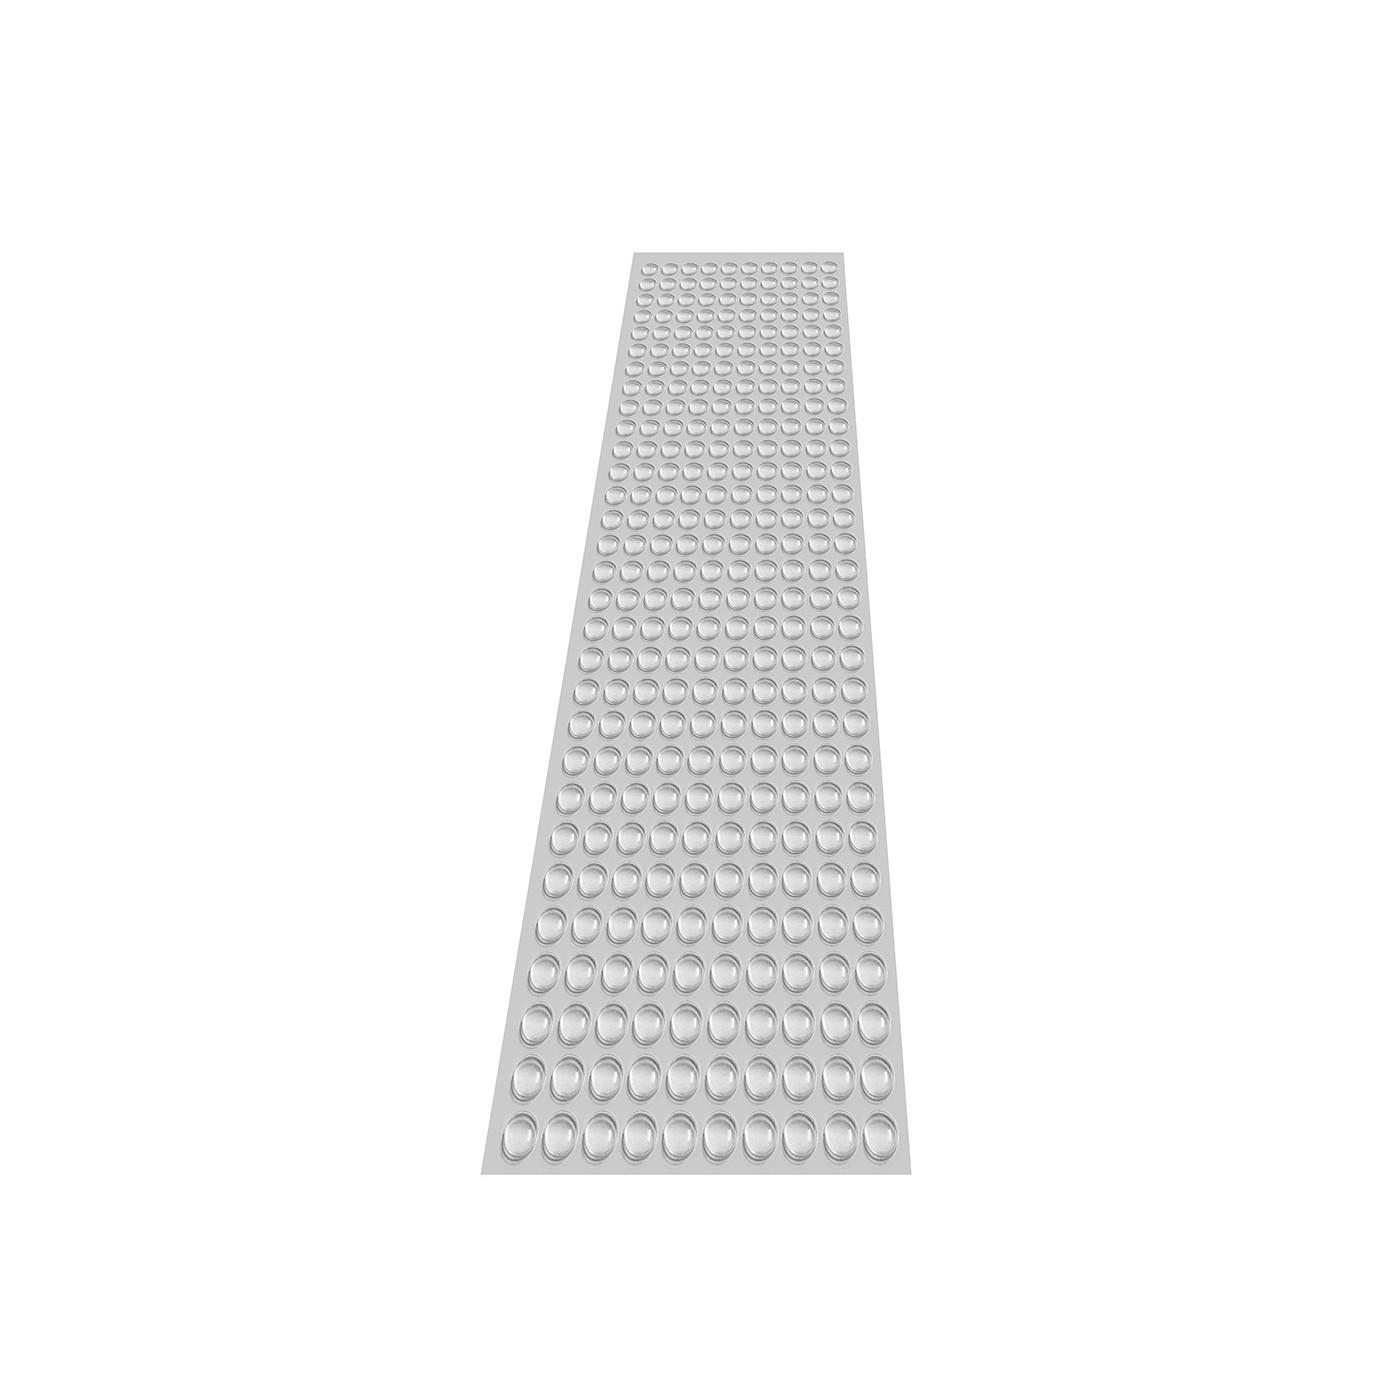 Set of 300 self adhesive buffers (type 3, 10.0x3.0 mm)  - 1